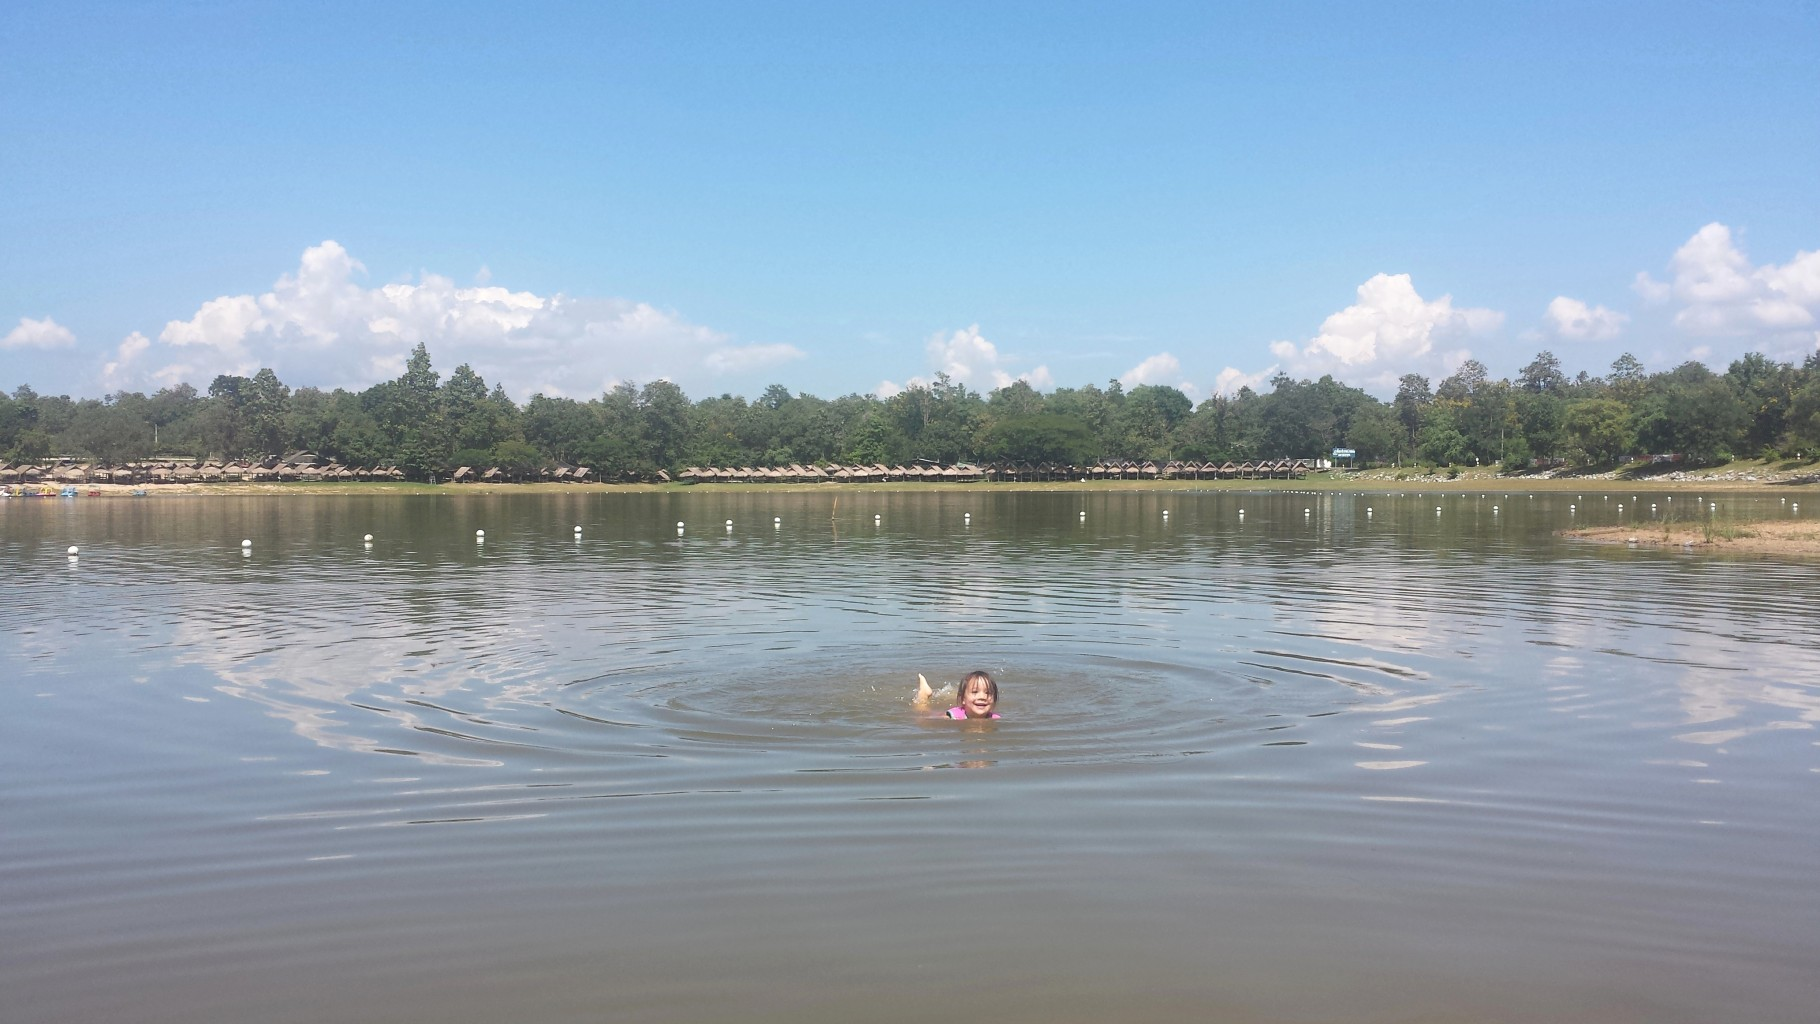 Huay Tueng Thao Lake